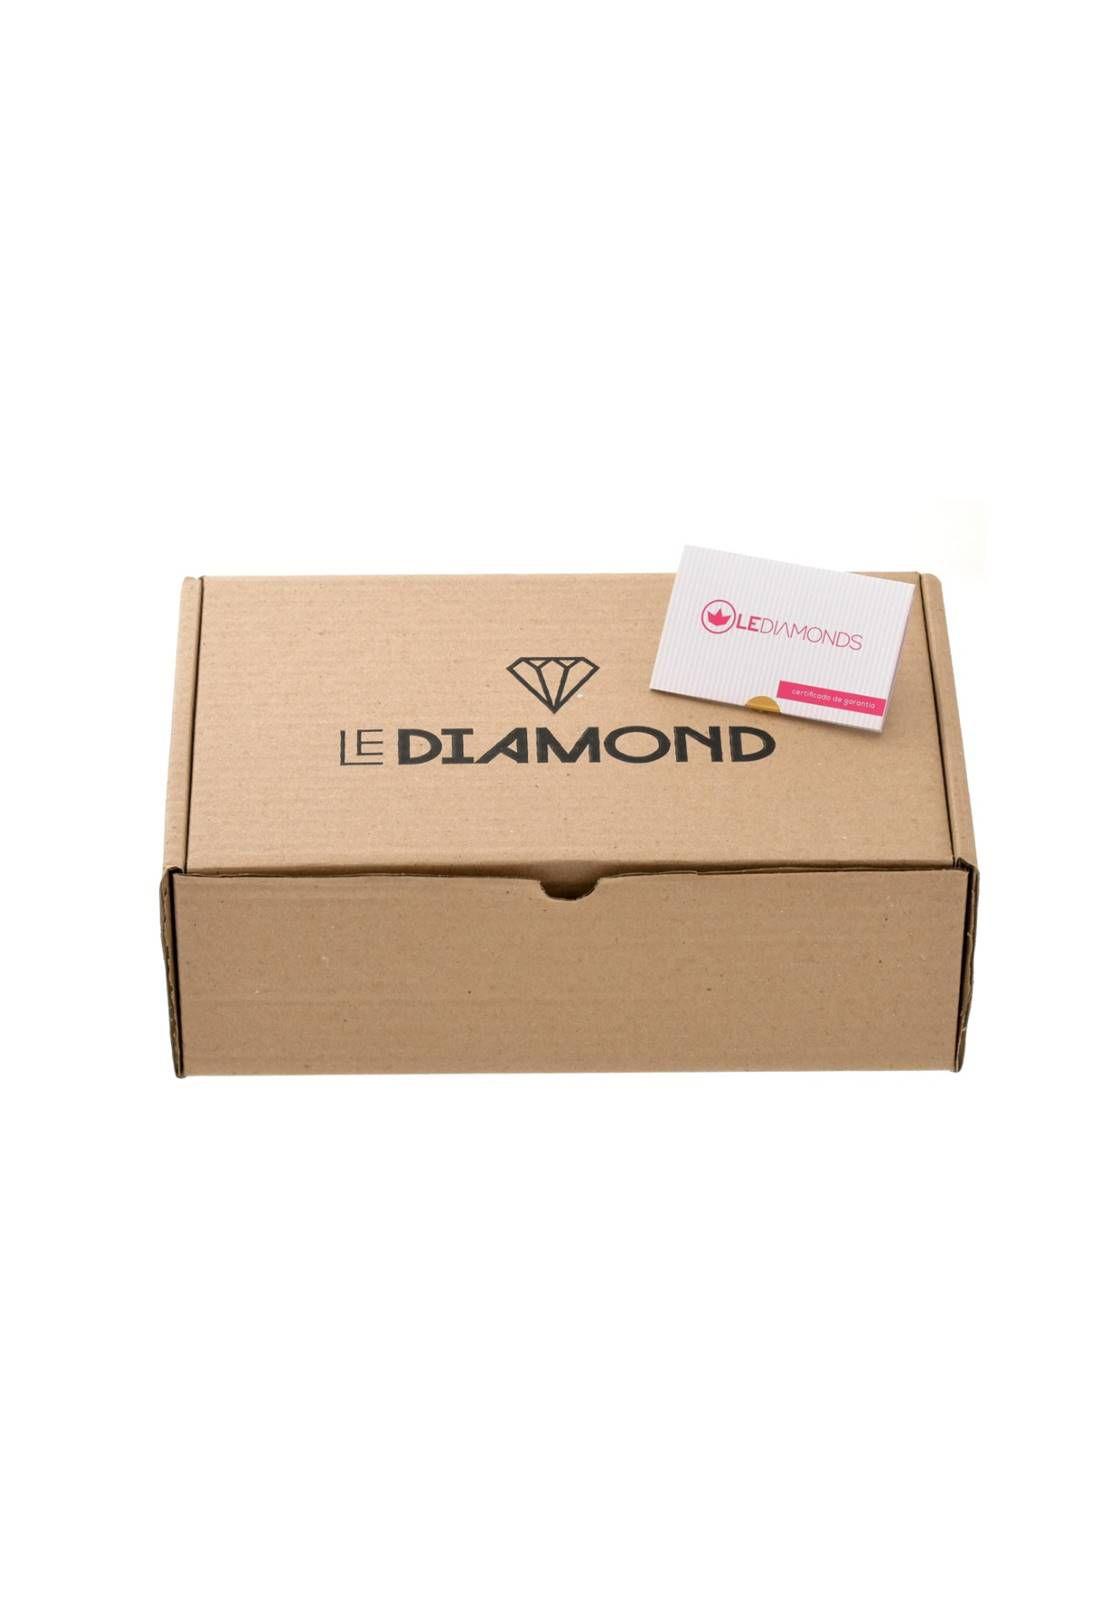 Colar Le Diamond Losango Dourado e Preto